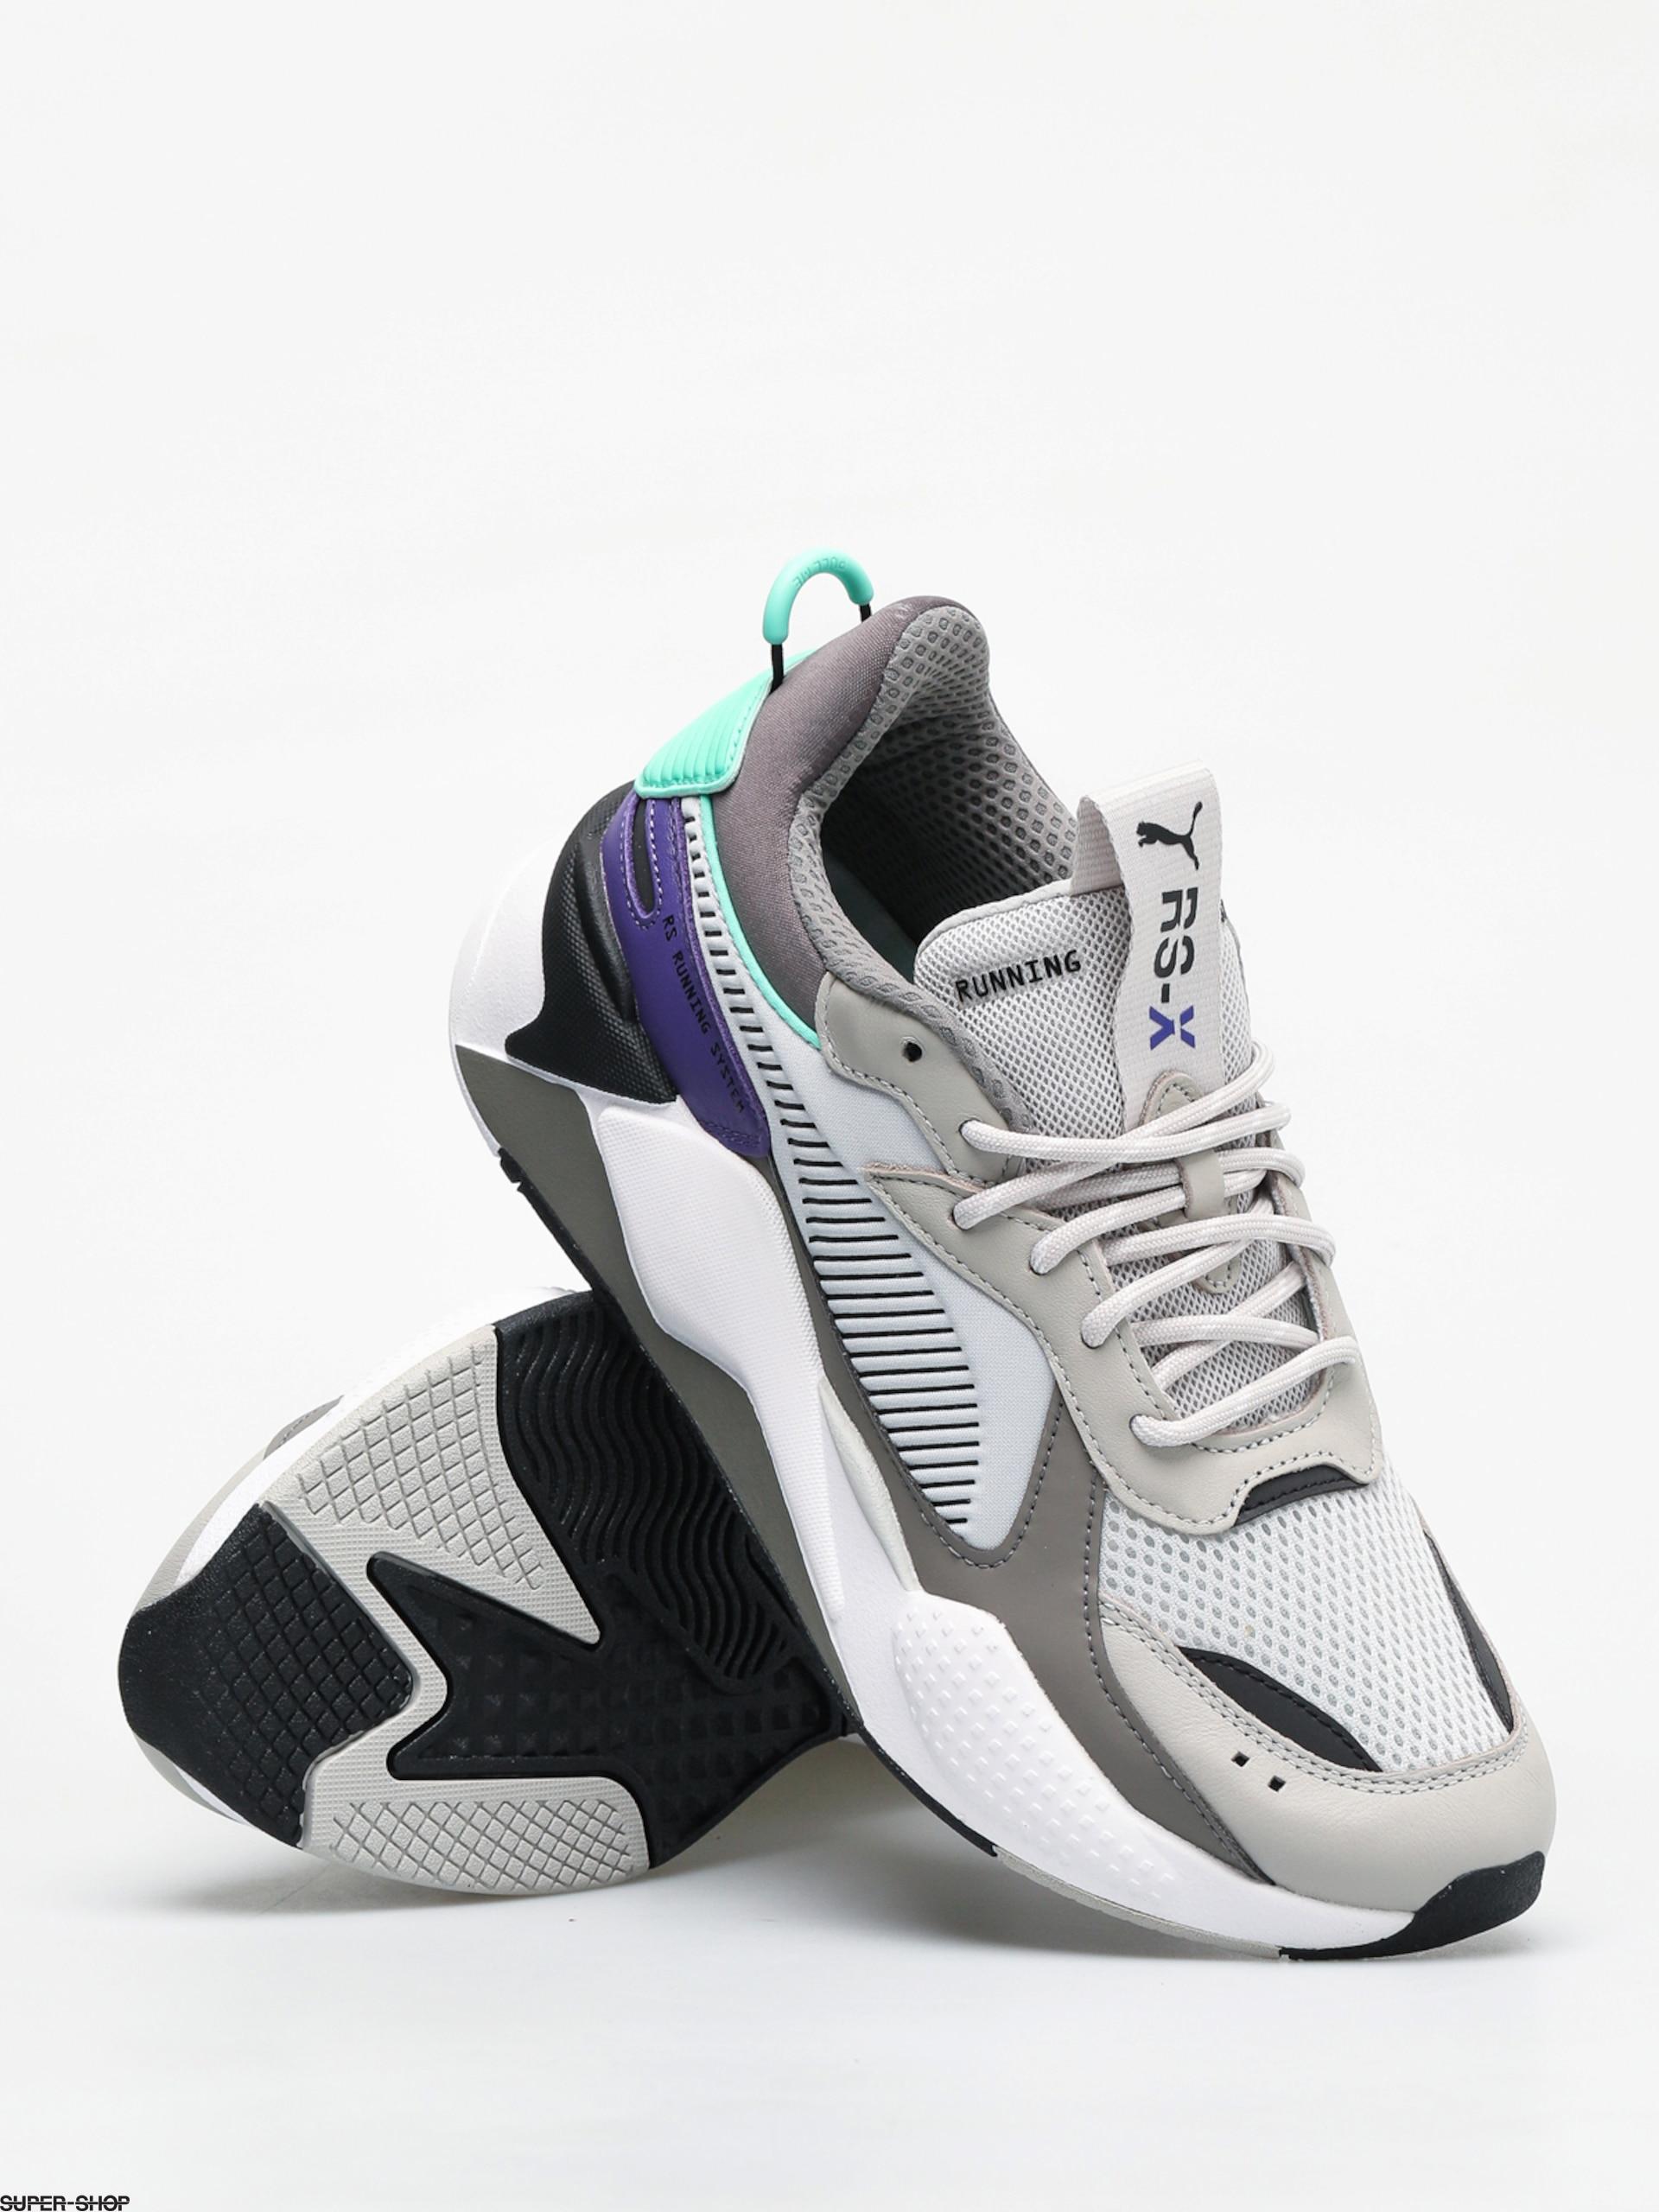 Puma RS X Tracks Sneakers   Best Travel